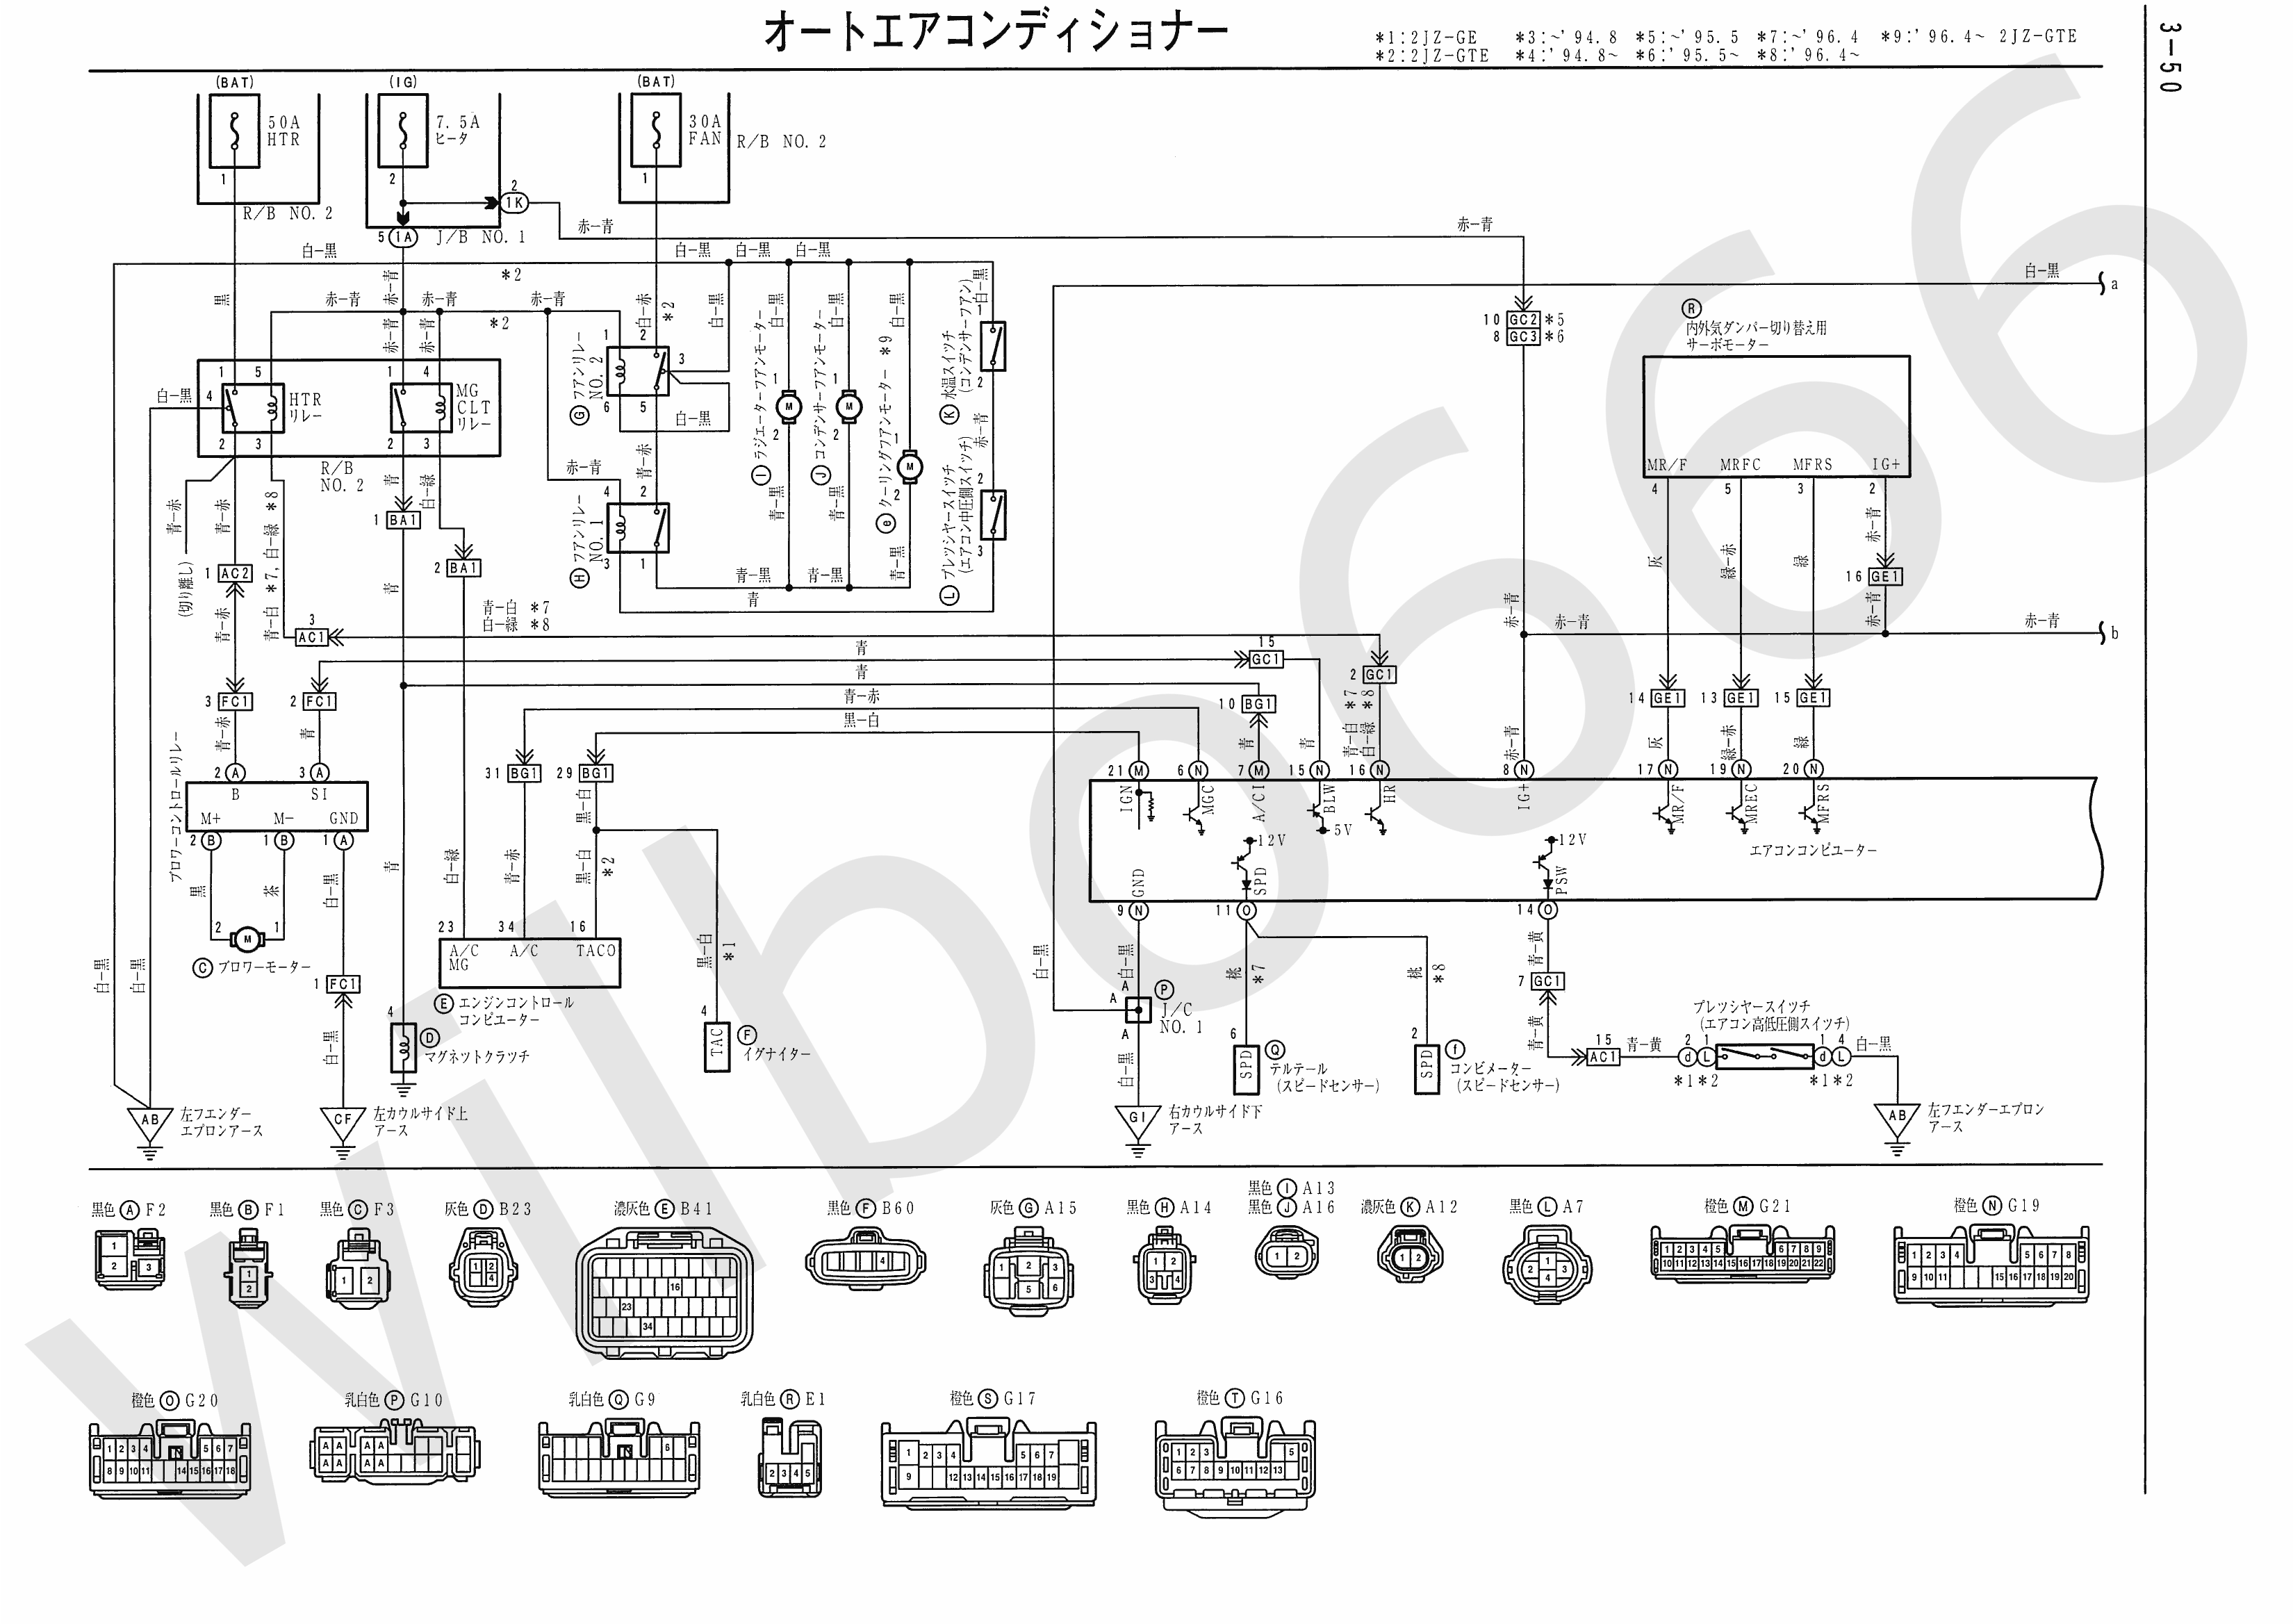 Stupendous Toyota Hilux Air Conditioner Wiring Diagram Basic Electronics Wiring Cloud Vieworaidewilluminateatxorg